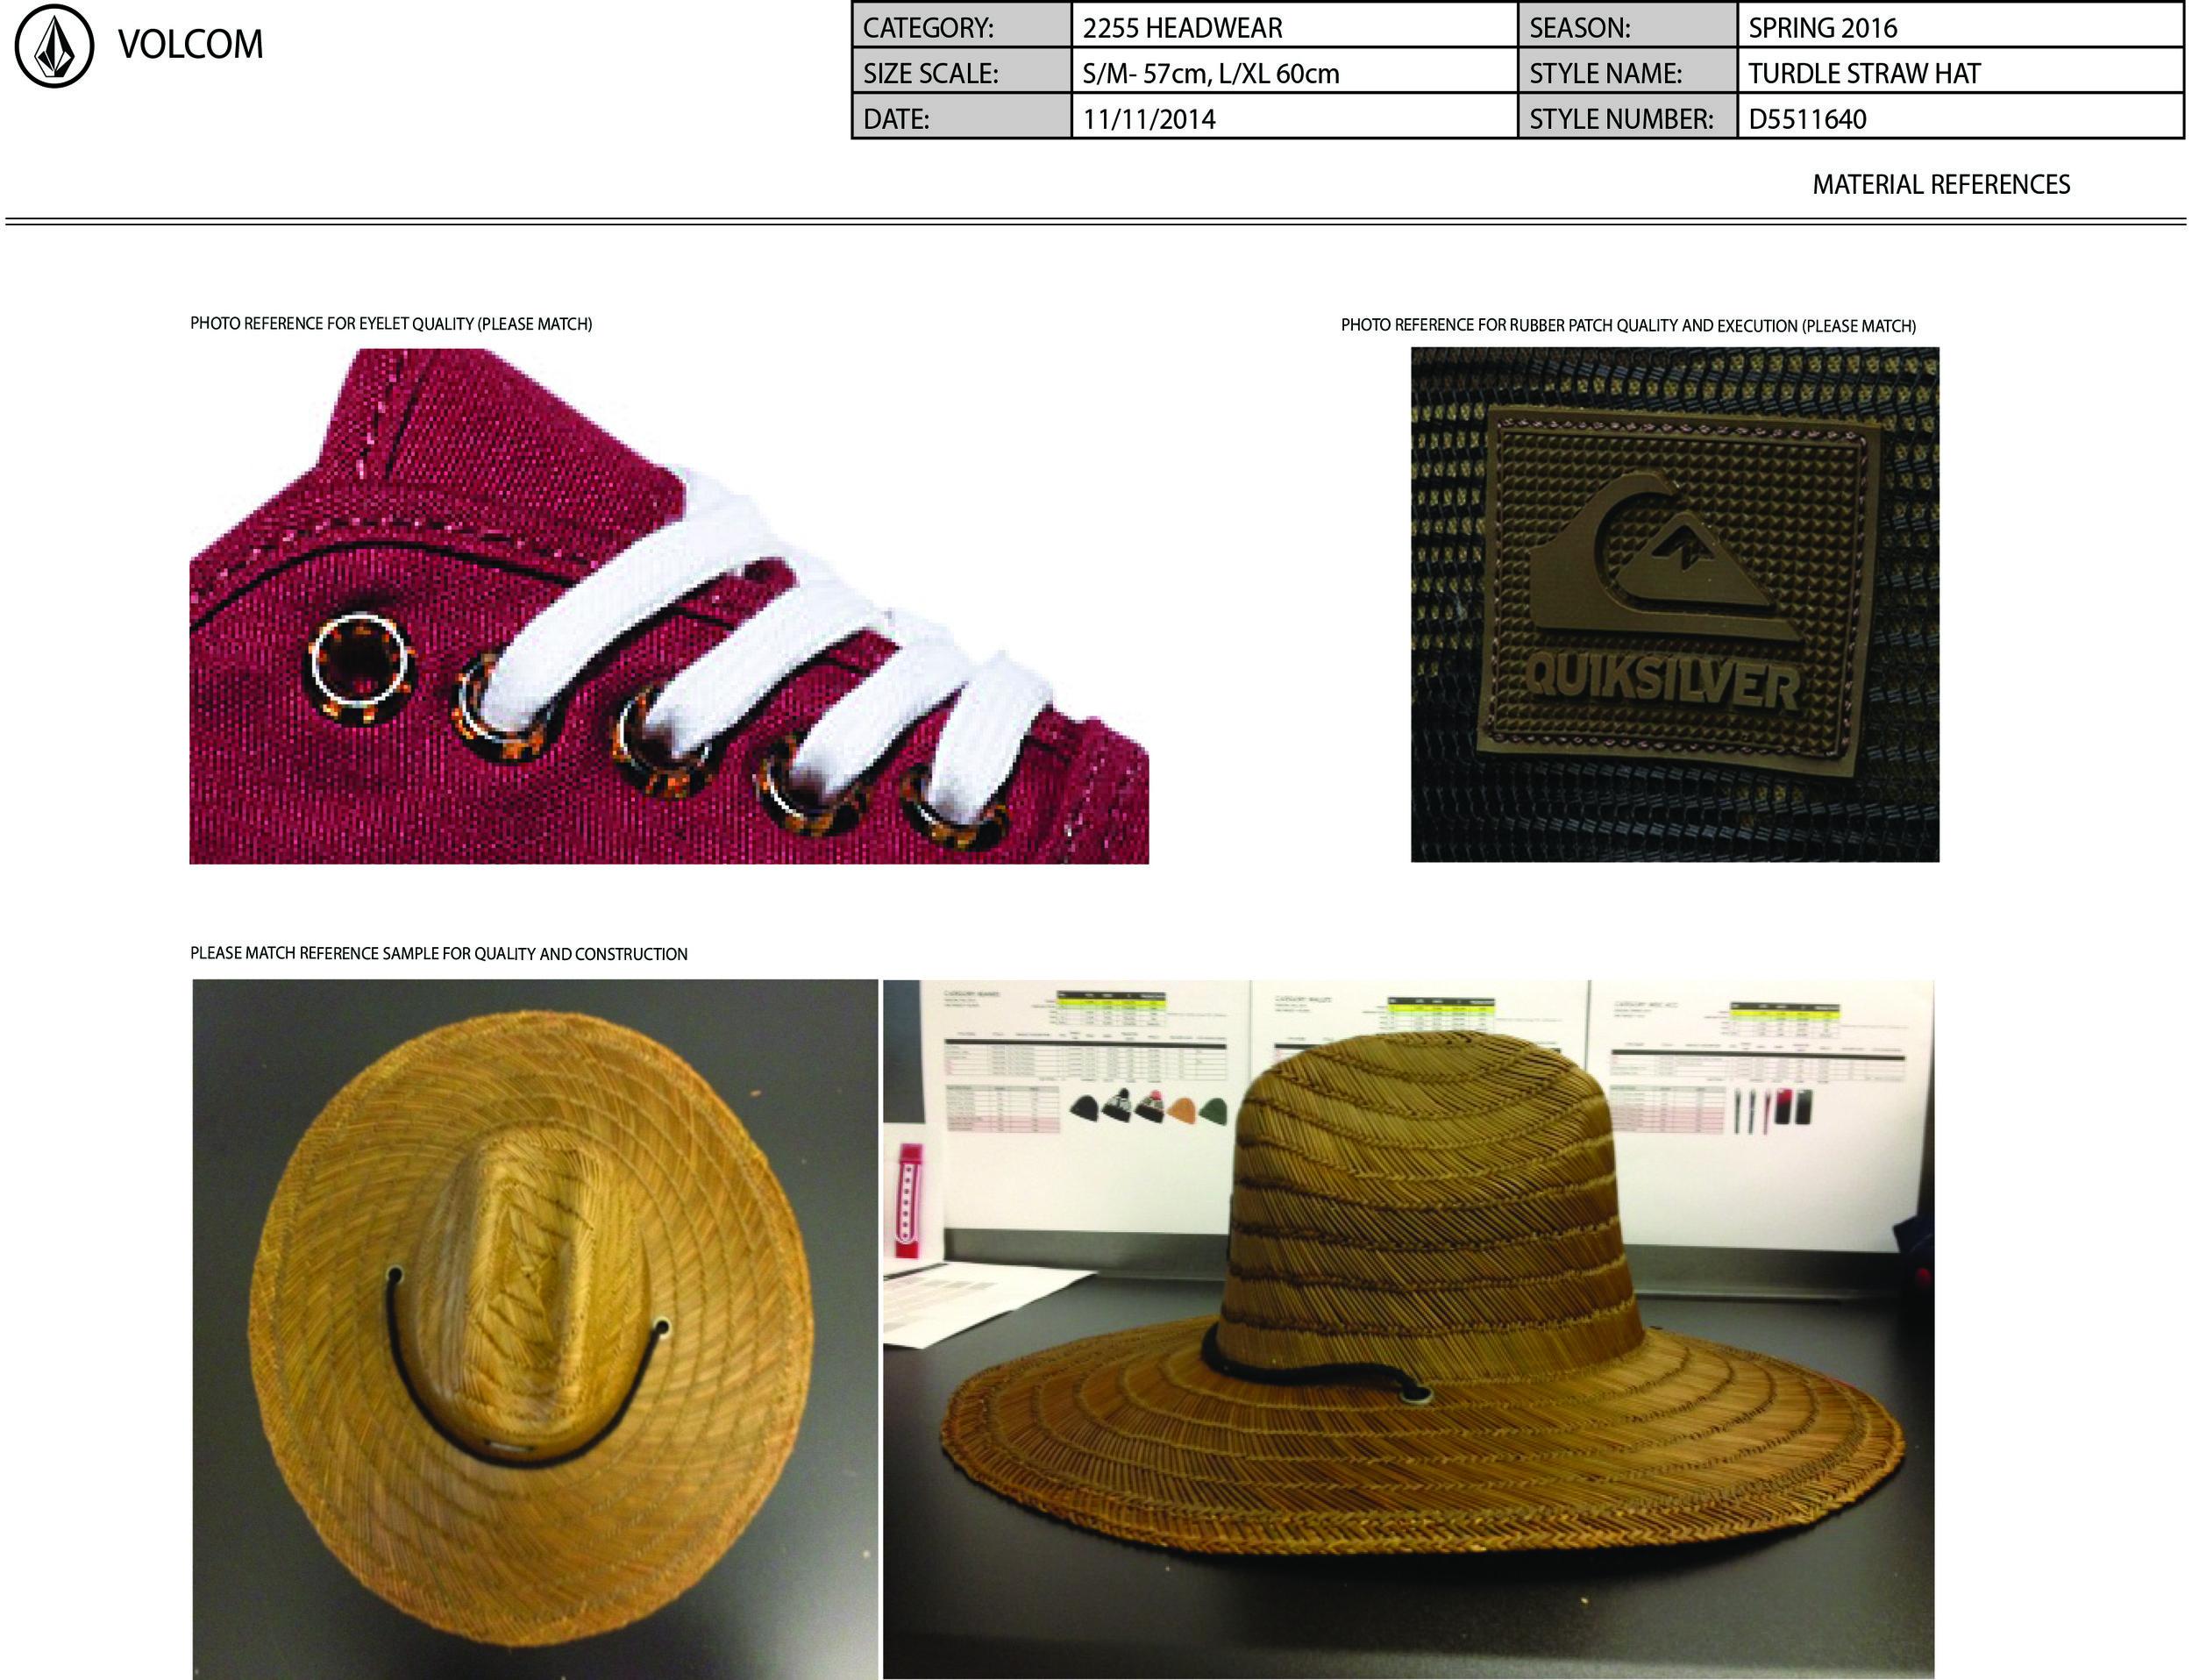 D5511640_TURDLE_STRAW_HAT-6.jpg